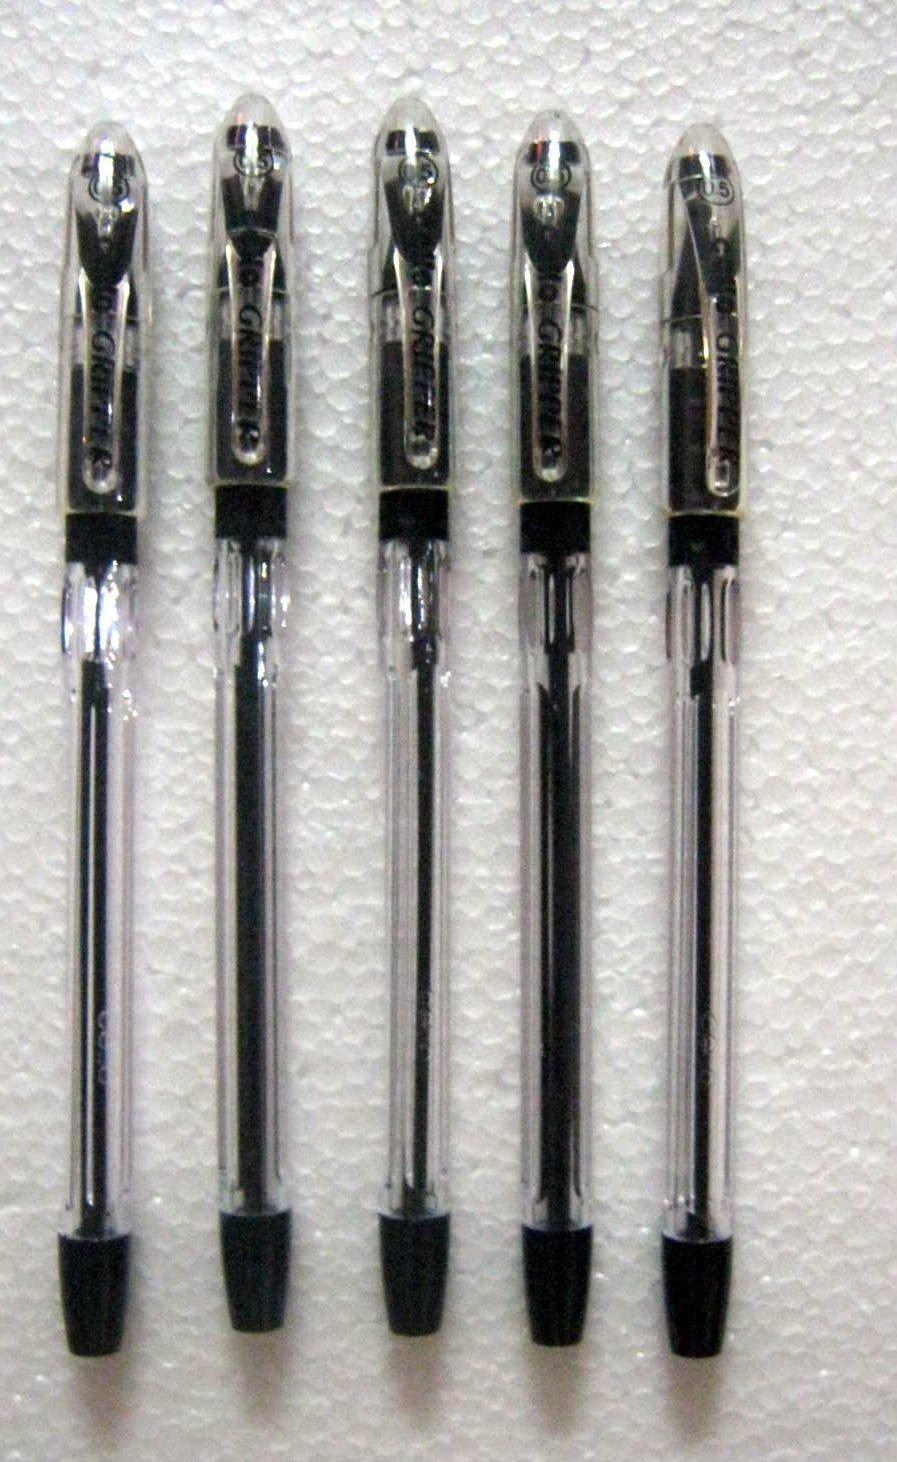 Set of 5 Cello Gripper Black Ink Ball Pen - Original Brand New - India